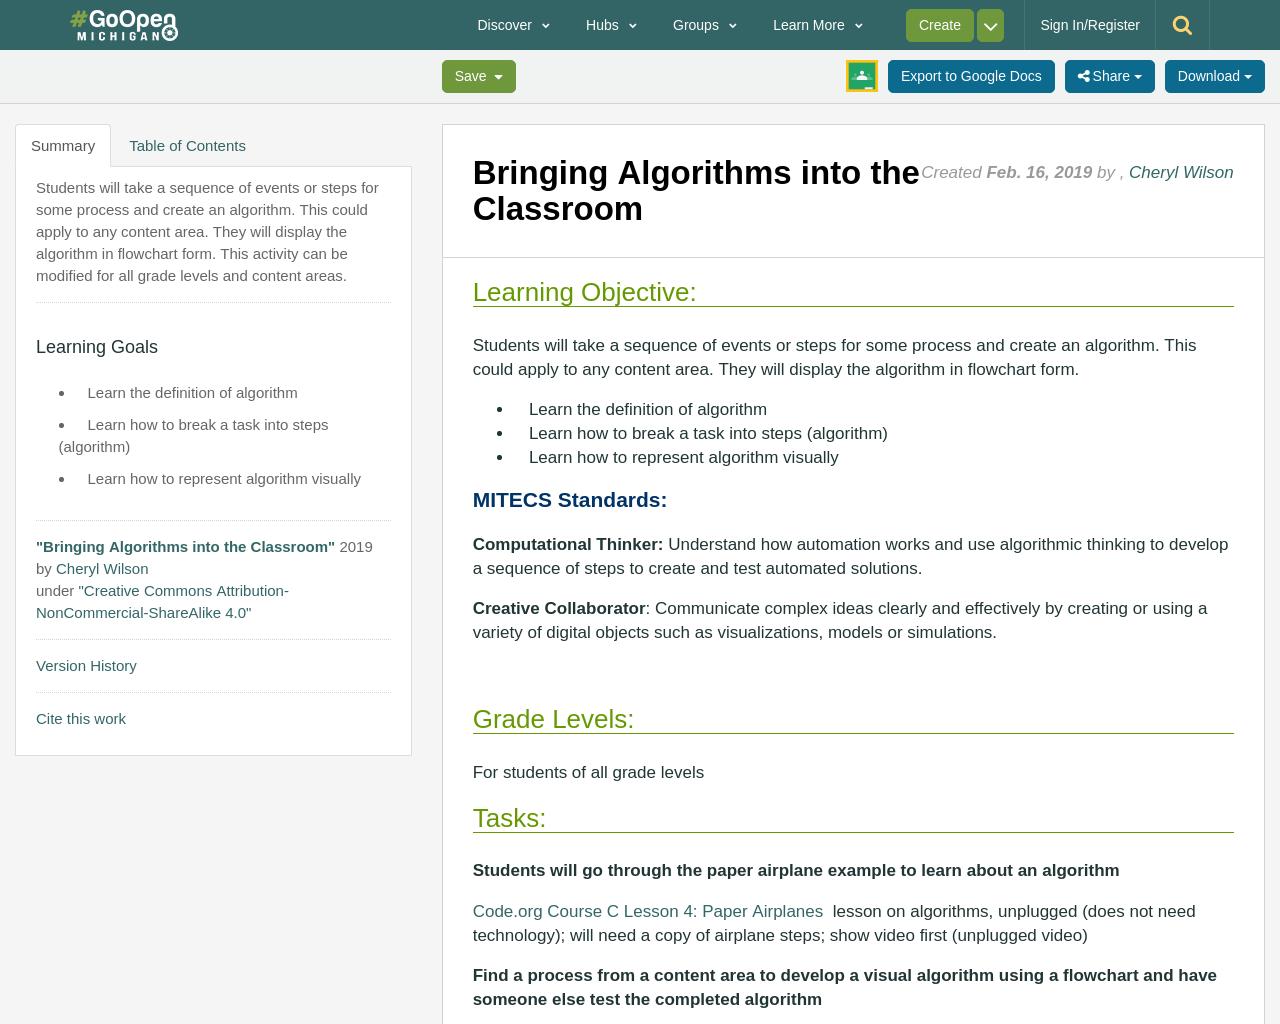 Bringing Algorithms into the Classroom Algorithm